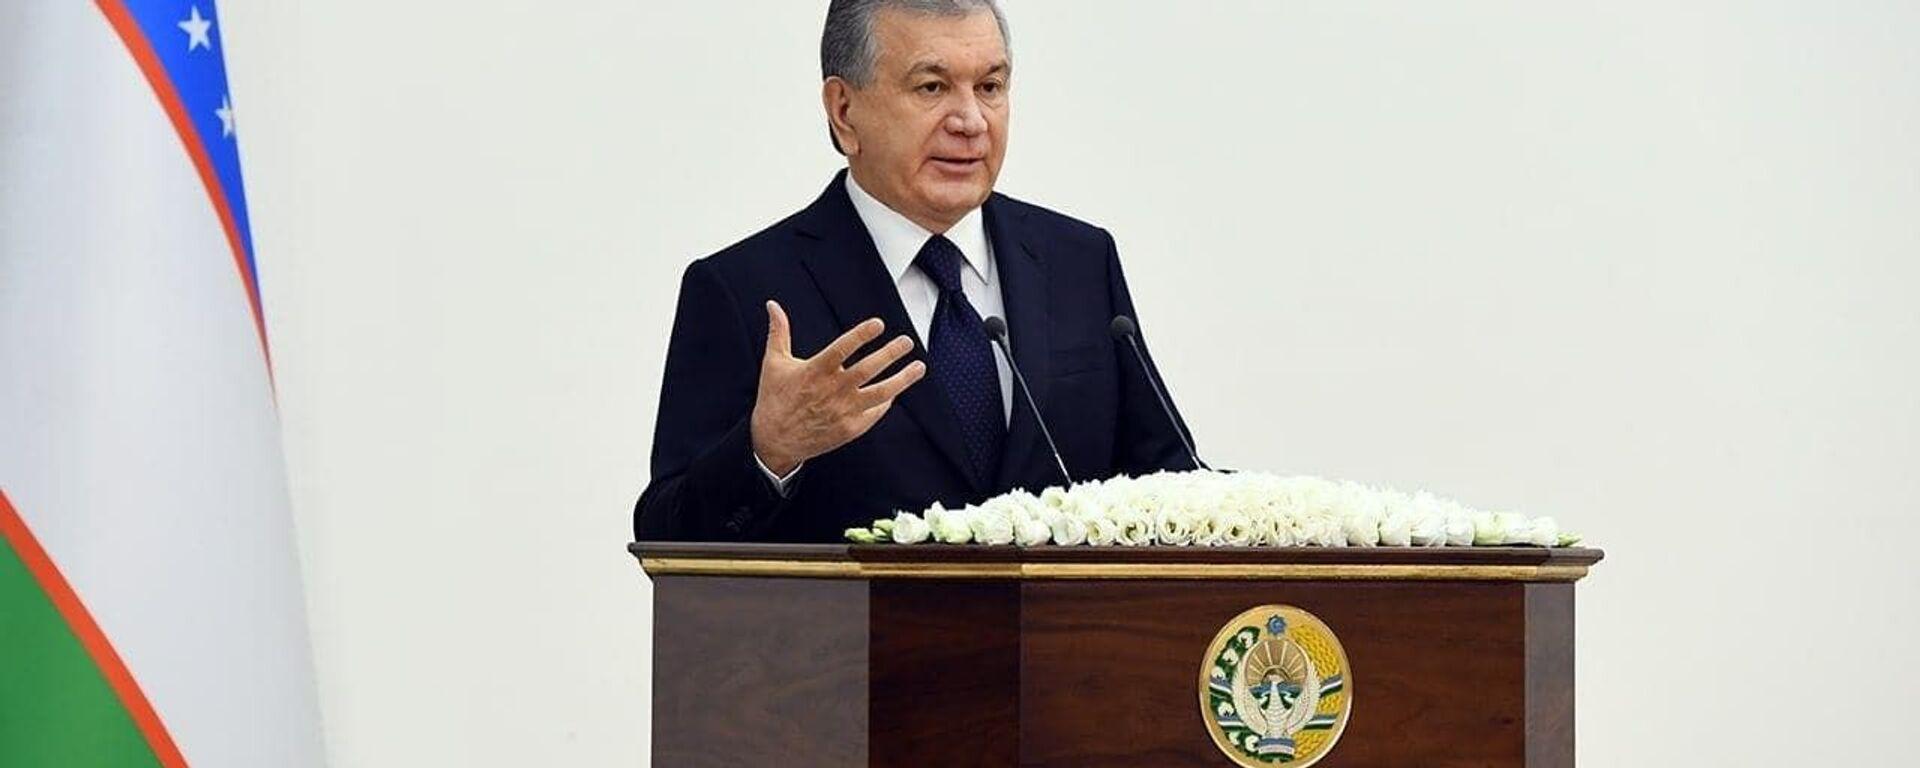 Prezident Uzbekistana Shavkat Mirziyoyev - Sputnik Oʻzbekiston, 1920, 13.12.2020